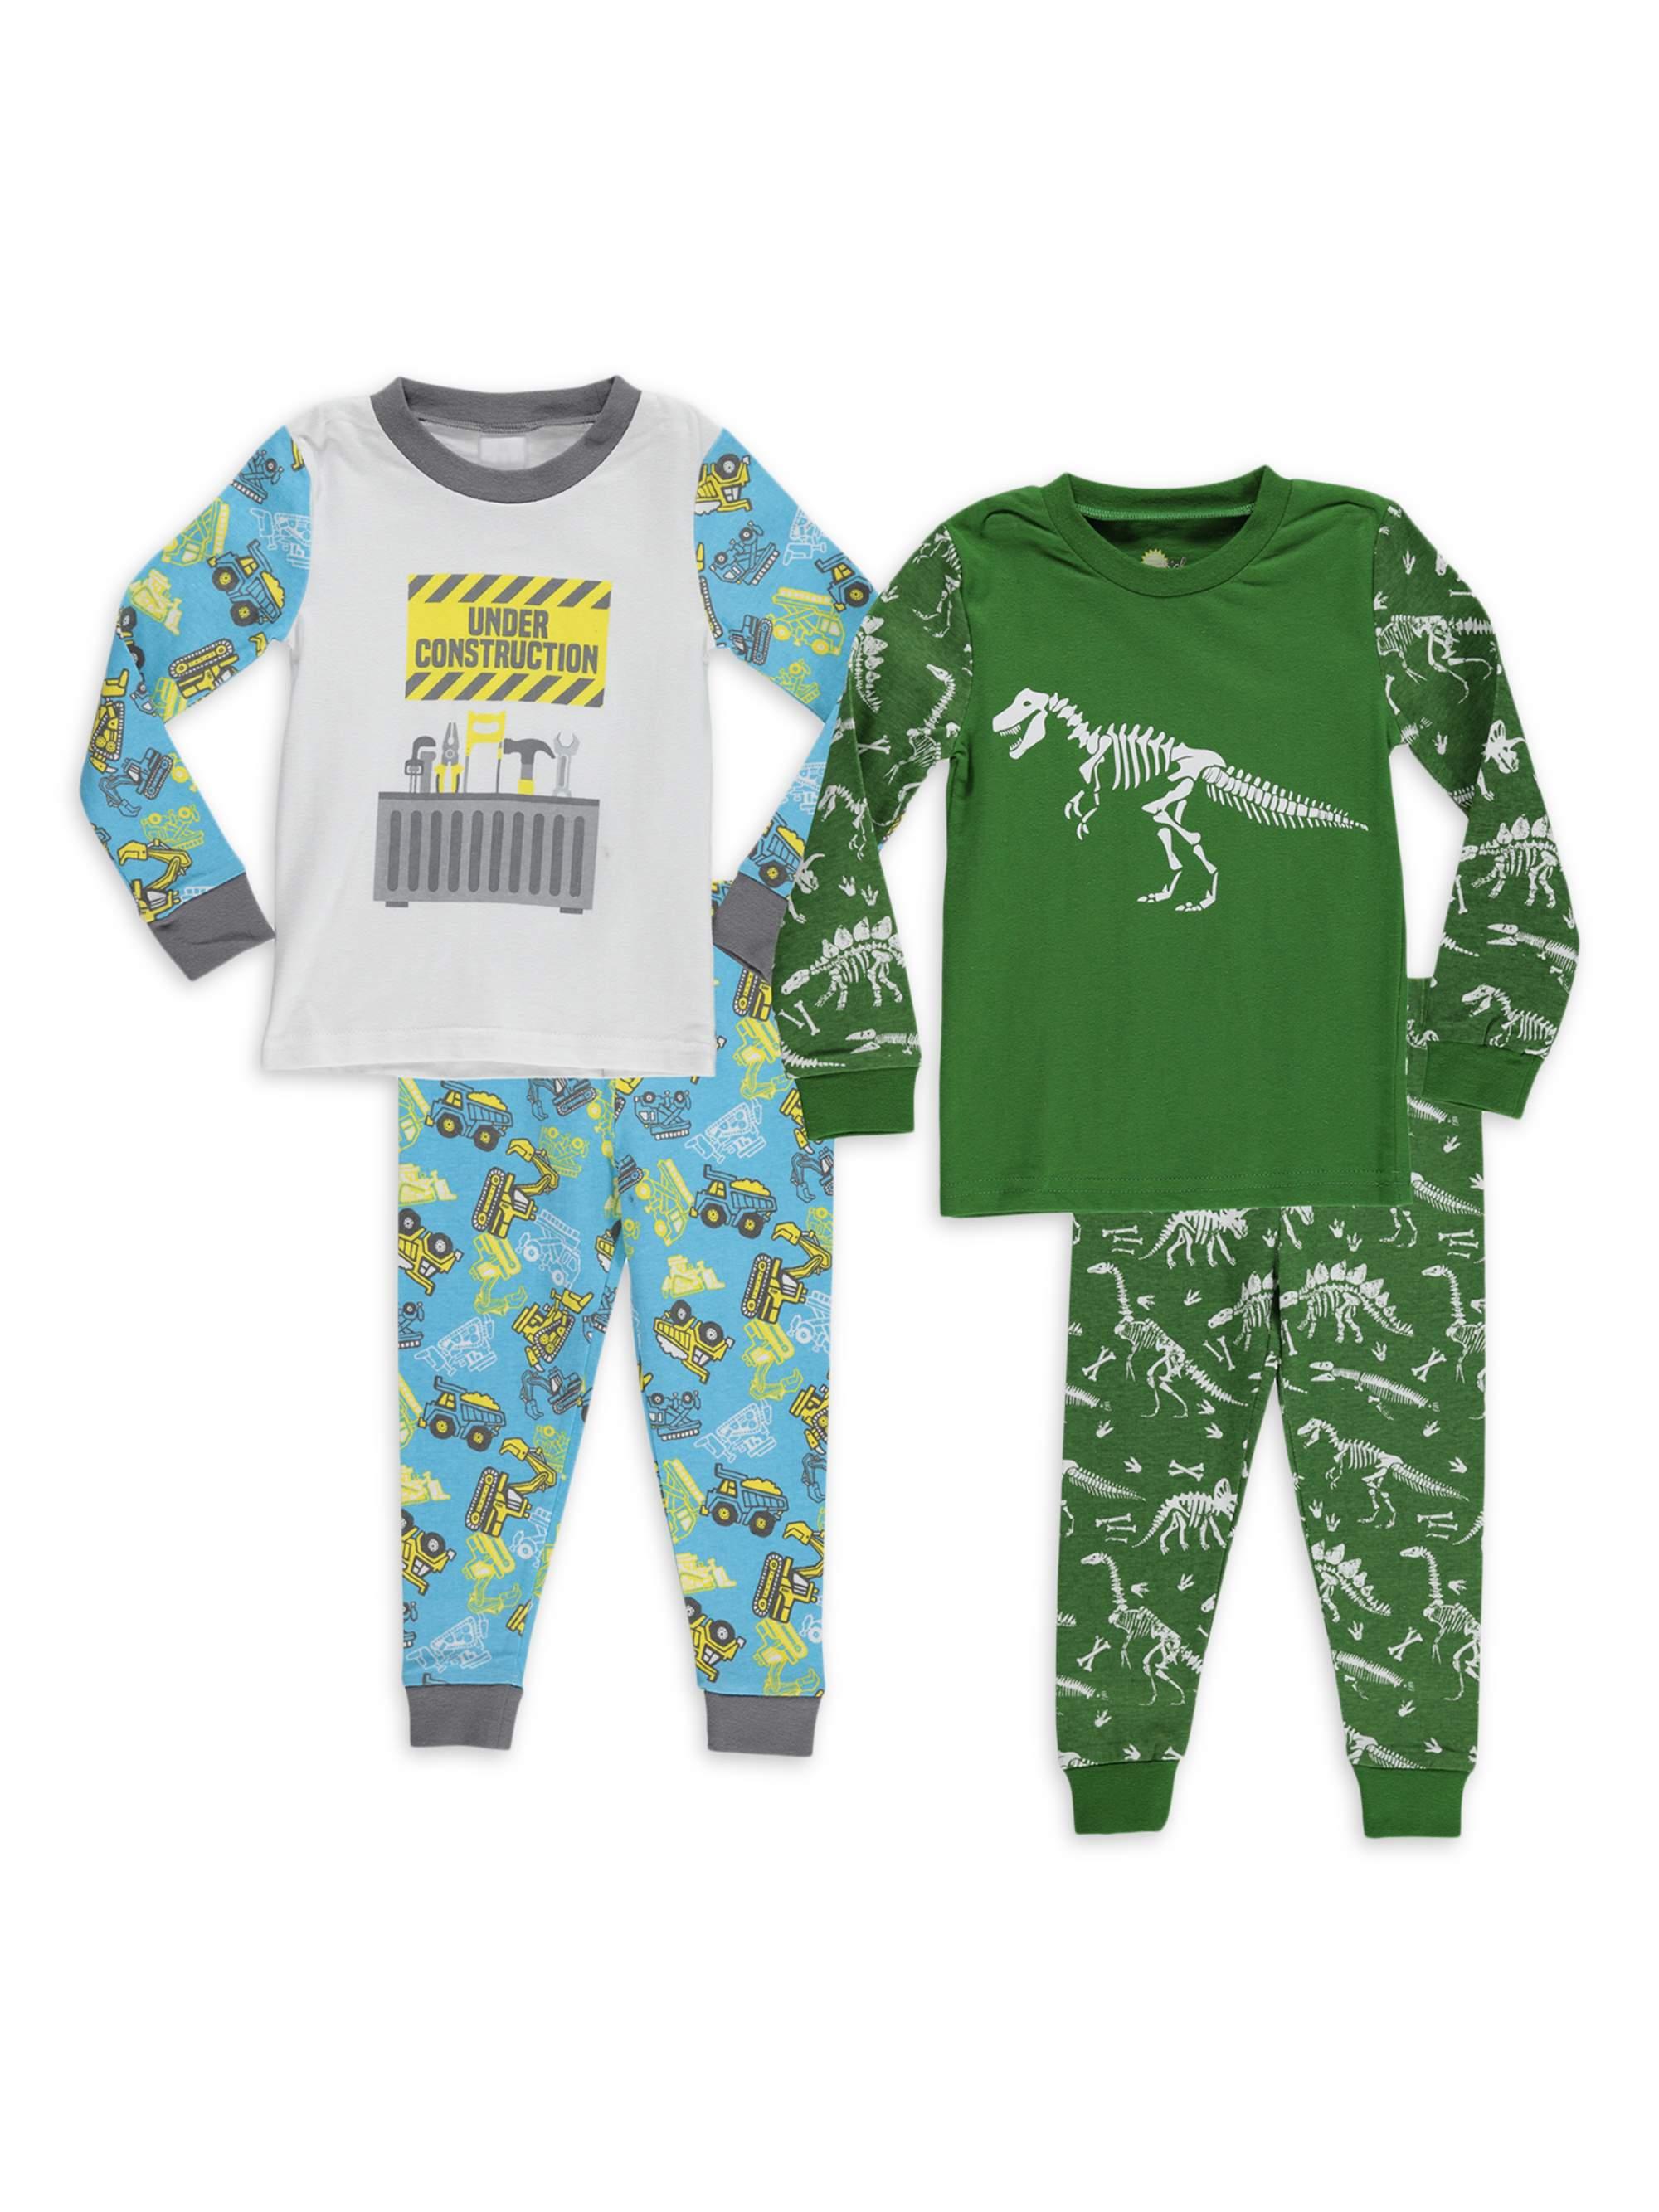 7 Heather Grey Kids Large NCAA by Outerstuff NCAA Indiana Hoosiers Kids Long Sleeve Tee /& Pant Sleep Set